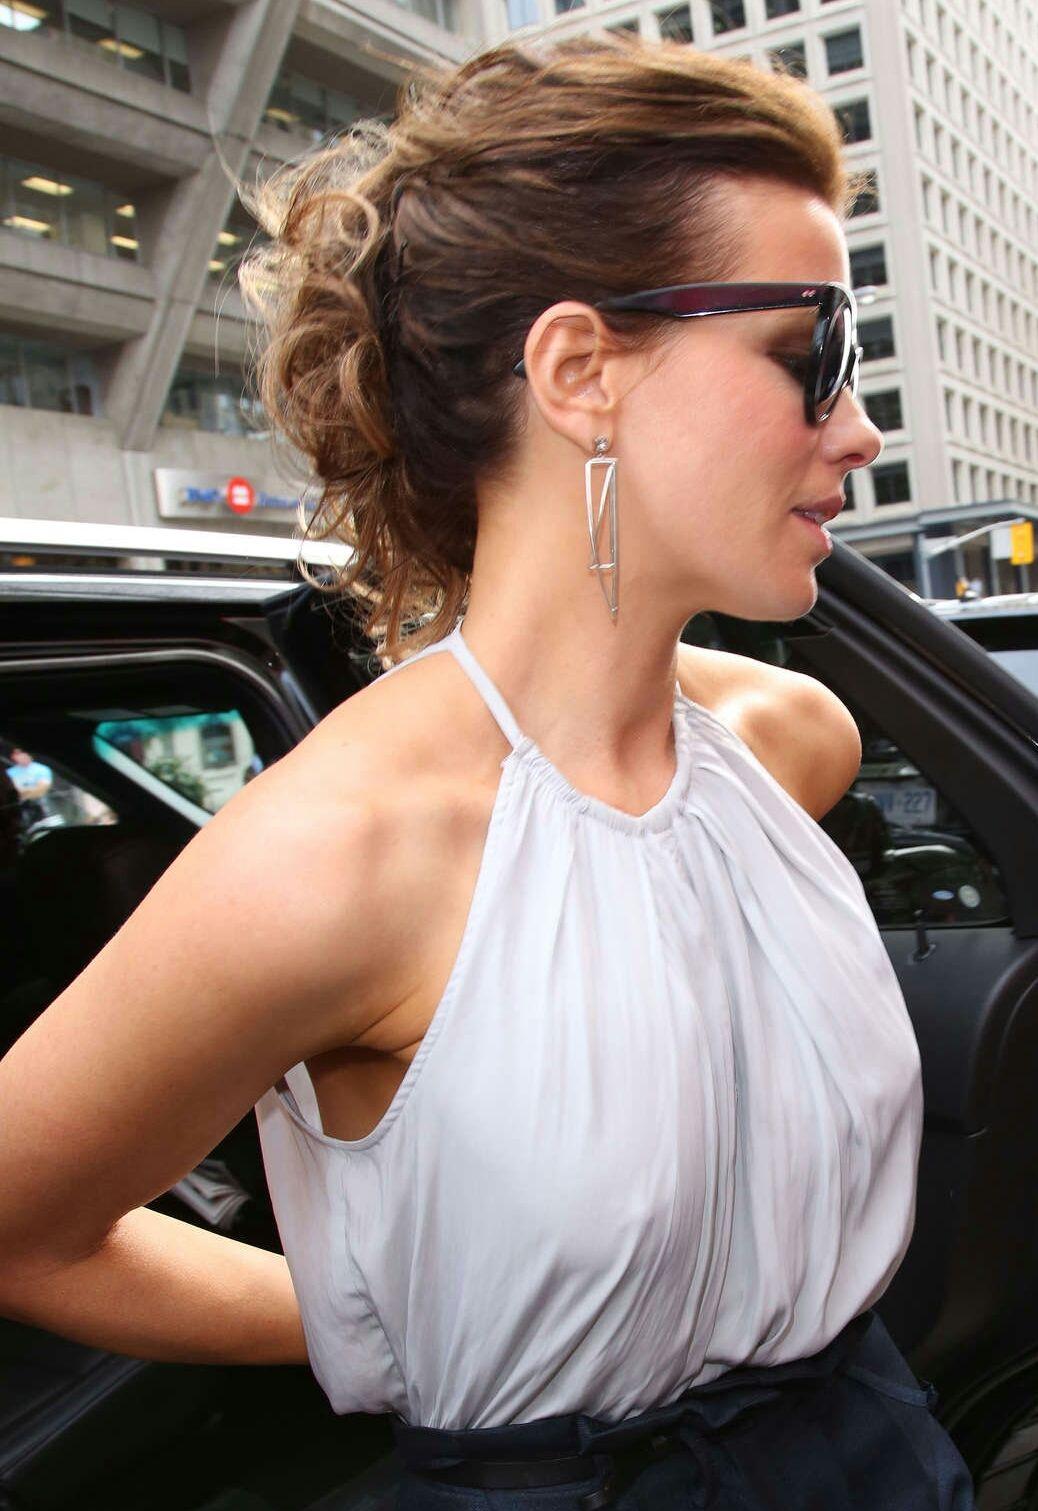 Alexis Ren: The Most Fuckable Fashionista. 2018-2019 celebrityes photos leaks!